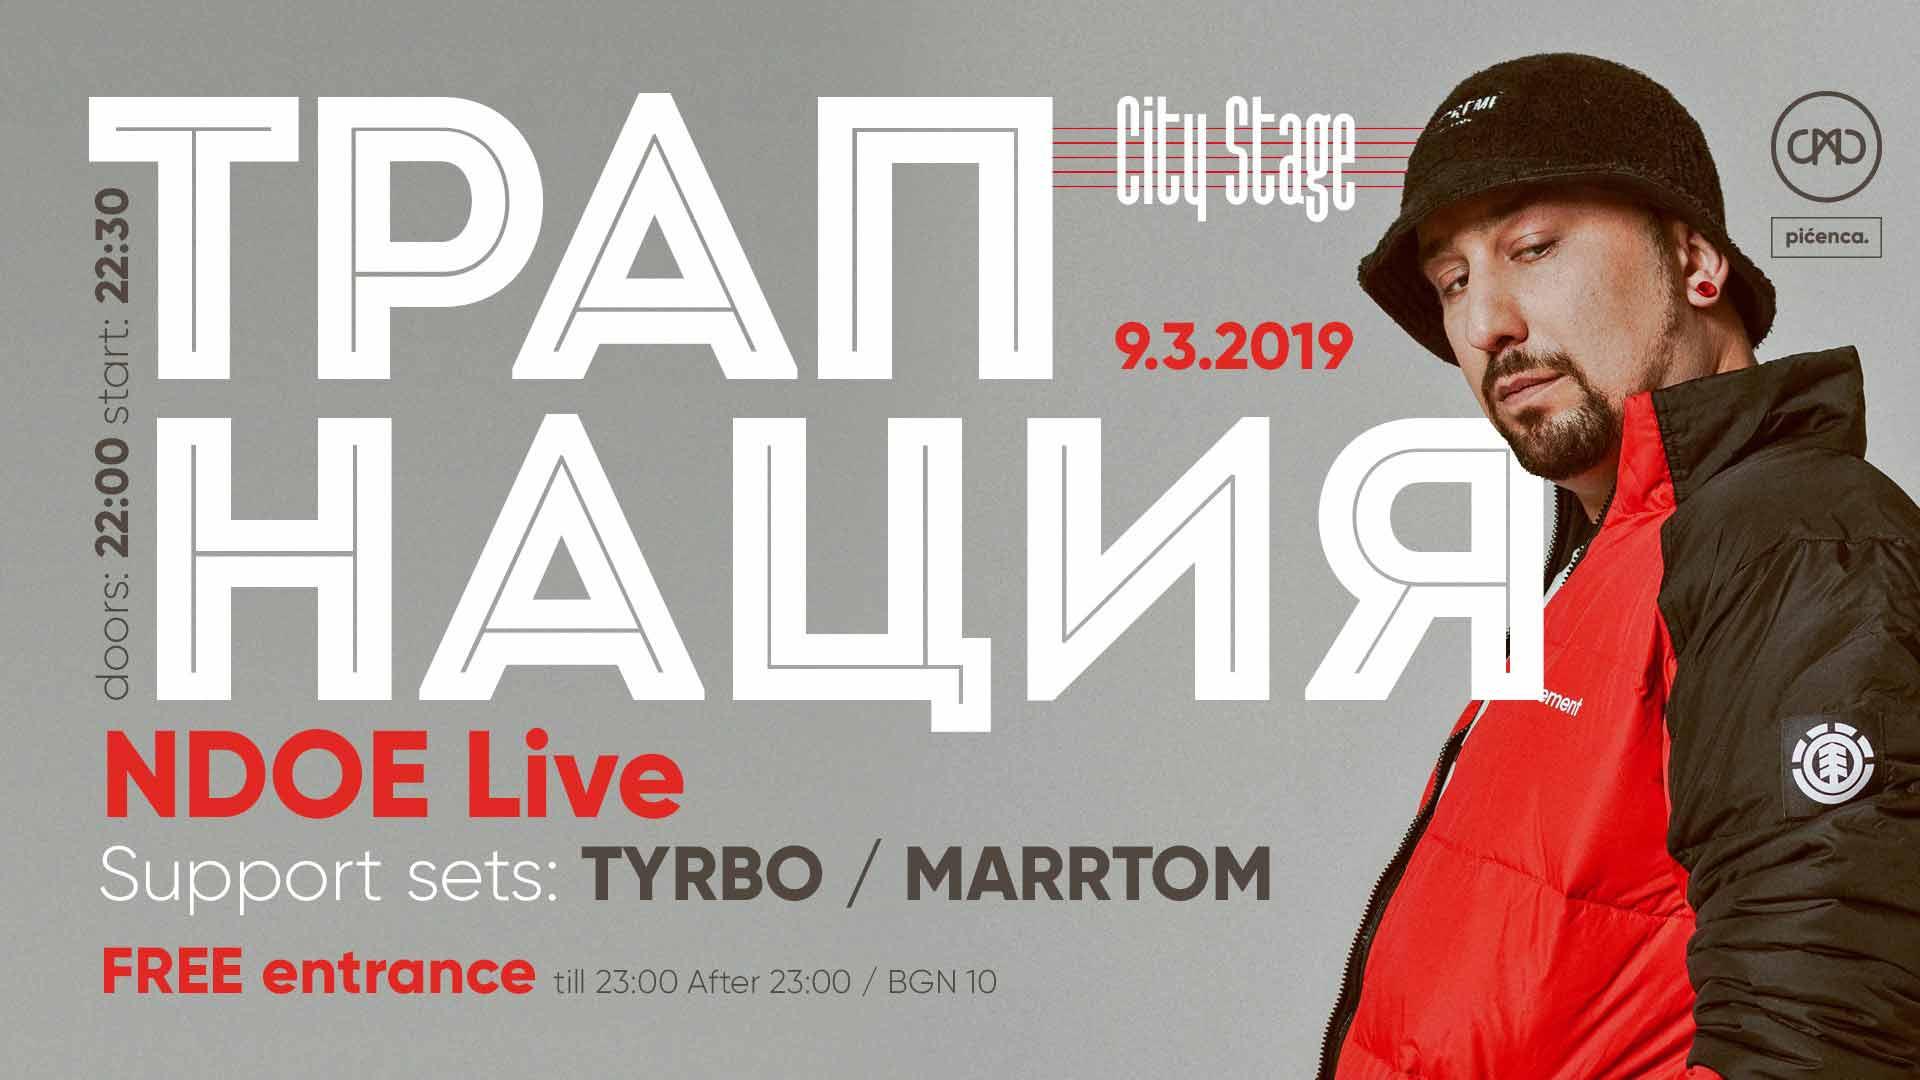 09 март 2019 г. 22:00 ч. City Stage | ТРАП нация // NDOE Live, Tyrbo, Marrtom